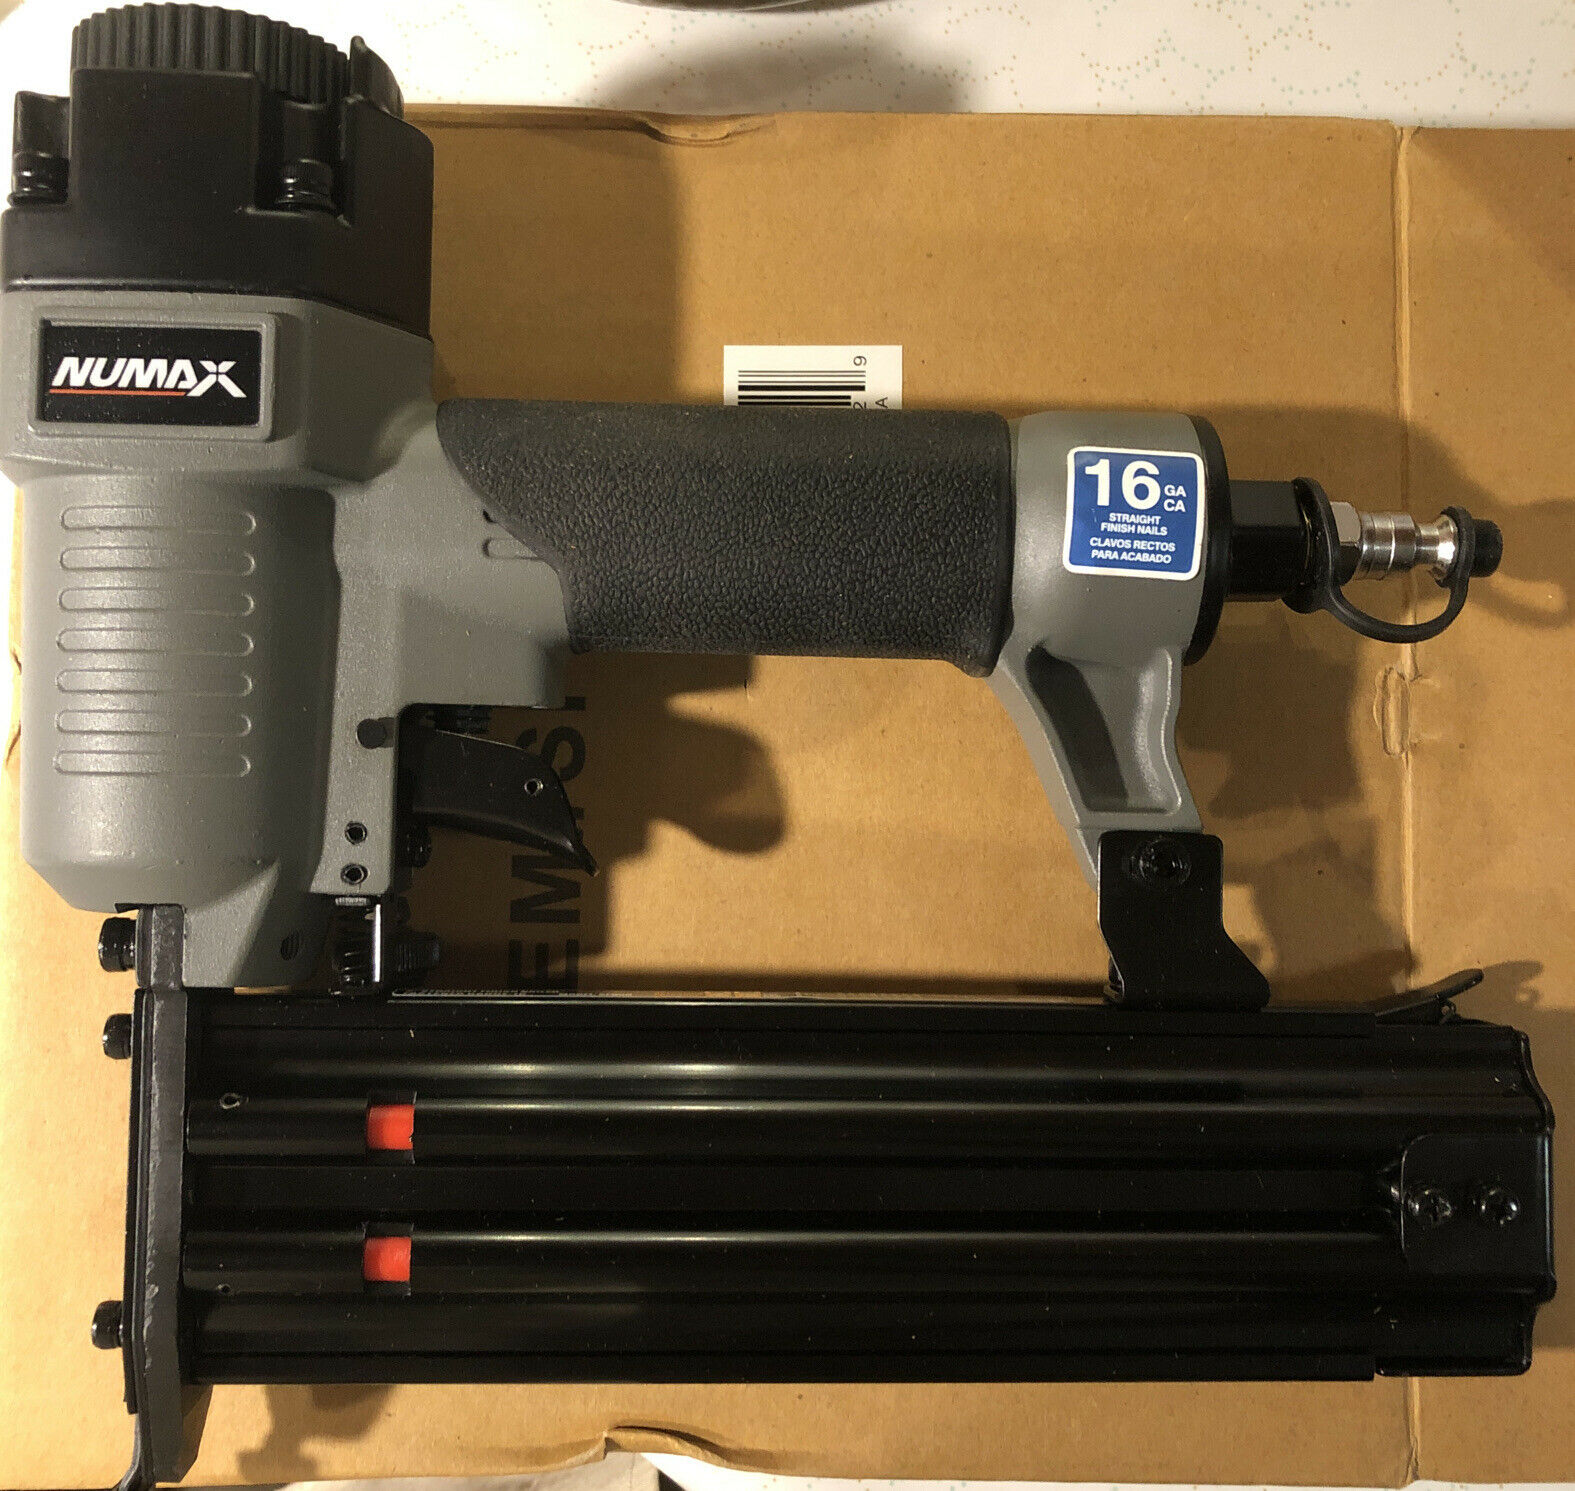 SFN50 9050ted NuMax SFN50 Pneumatic 16 Gauge 2 Straight Finish Nailer NIB